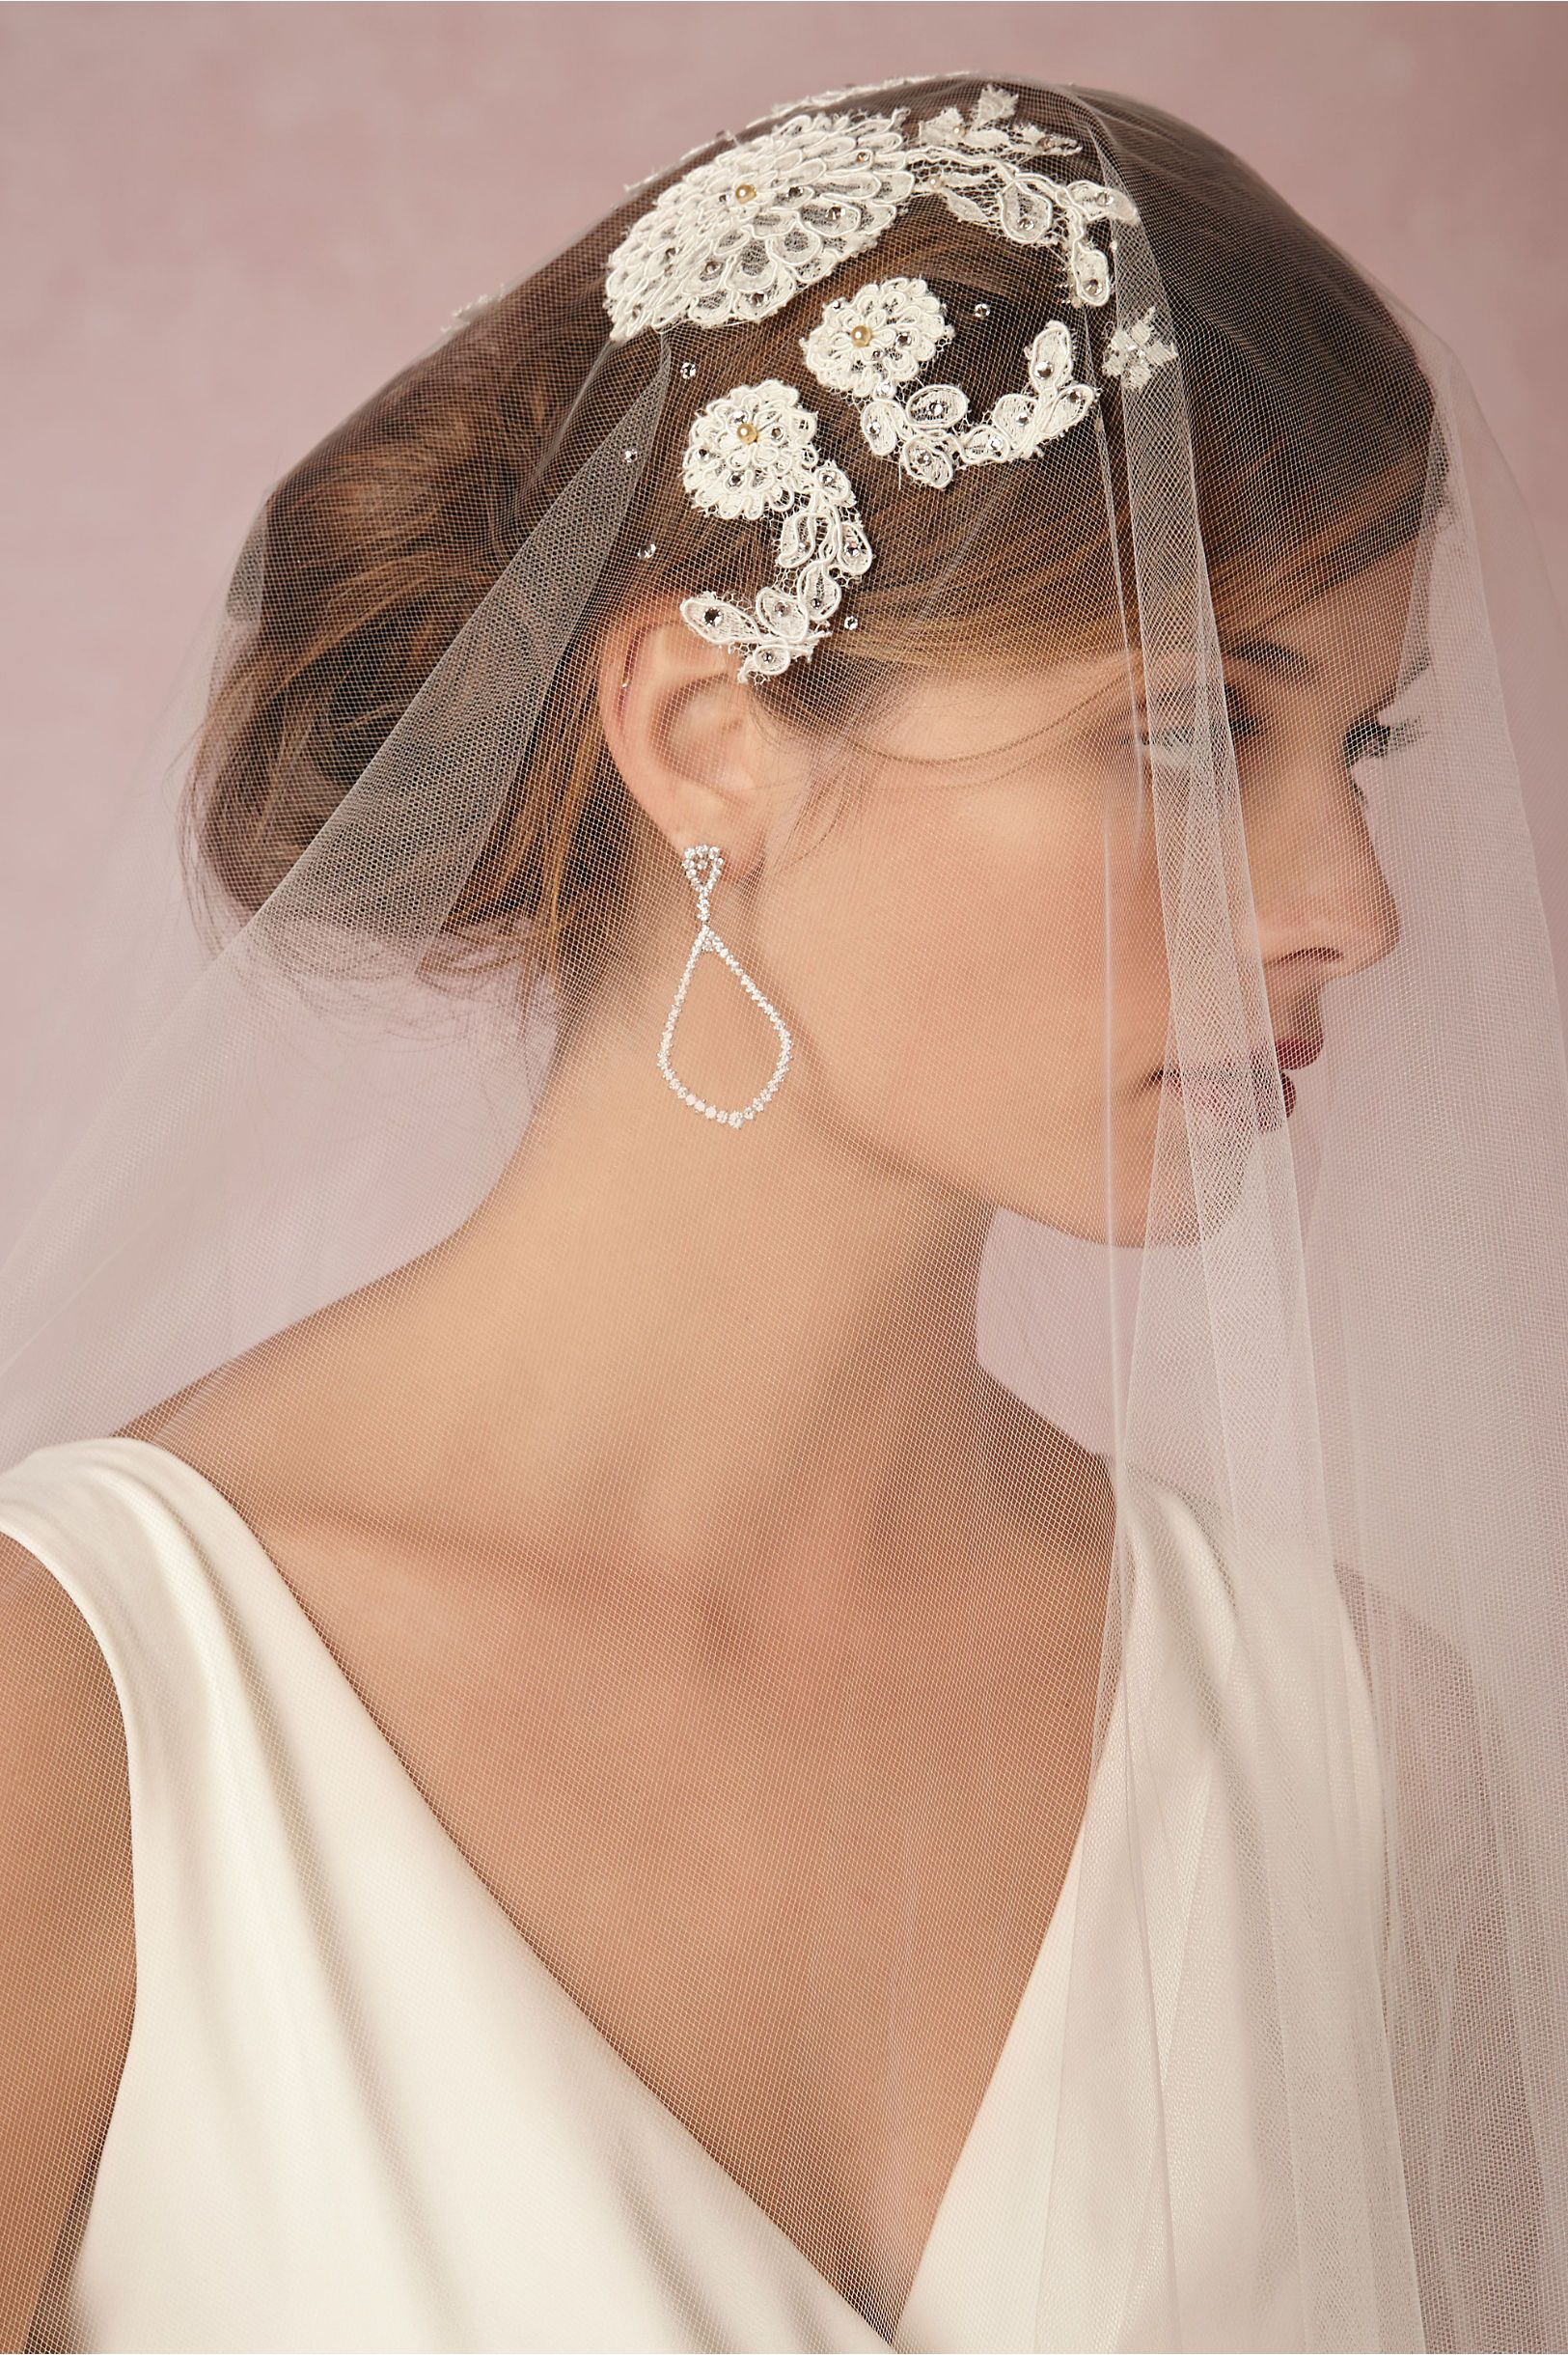 English Rose Cap Veil in Bride Veils & Headpieces at BHLDN